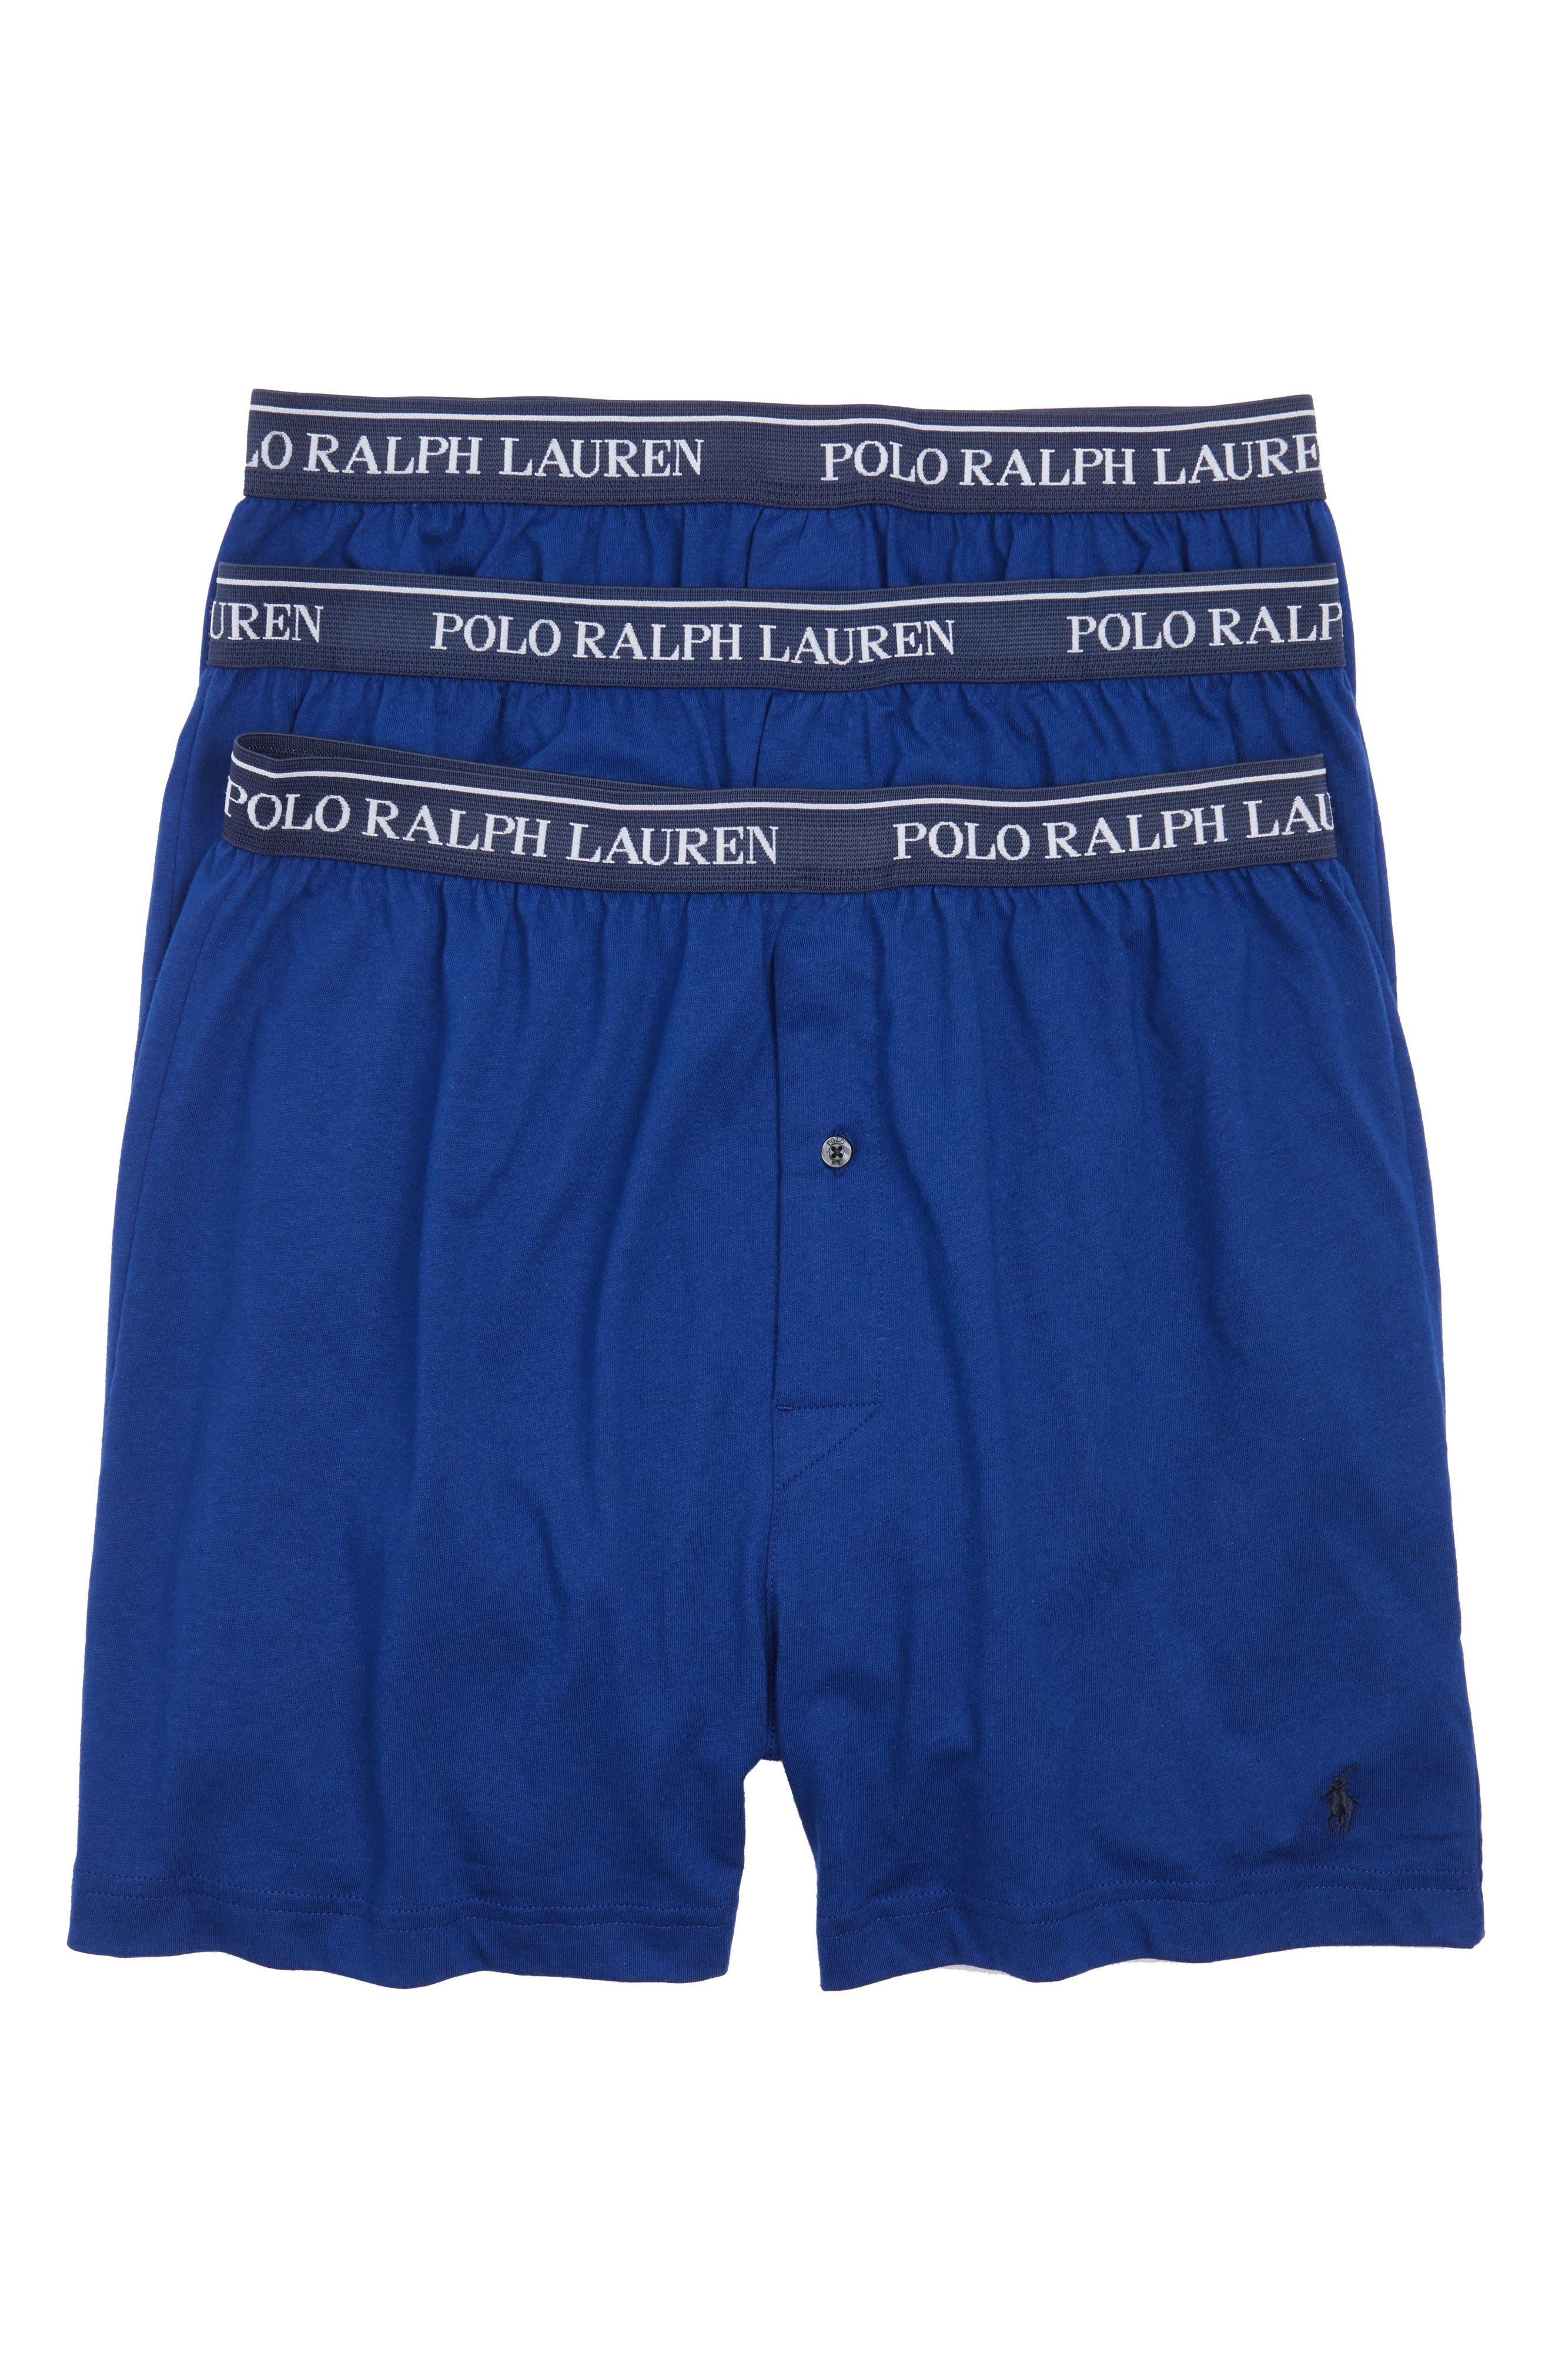 3-Pack Cotton Boxers,                         Main,                         color, 420